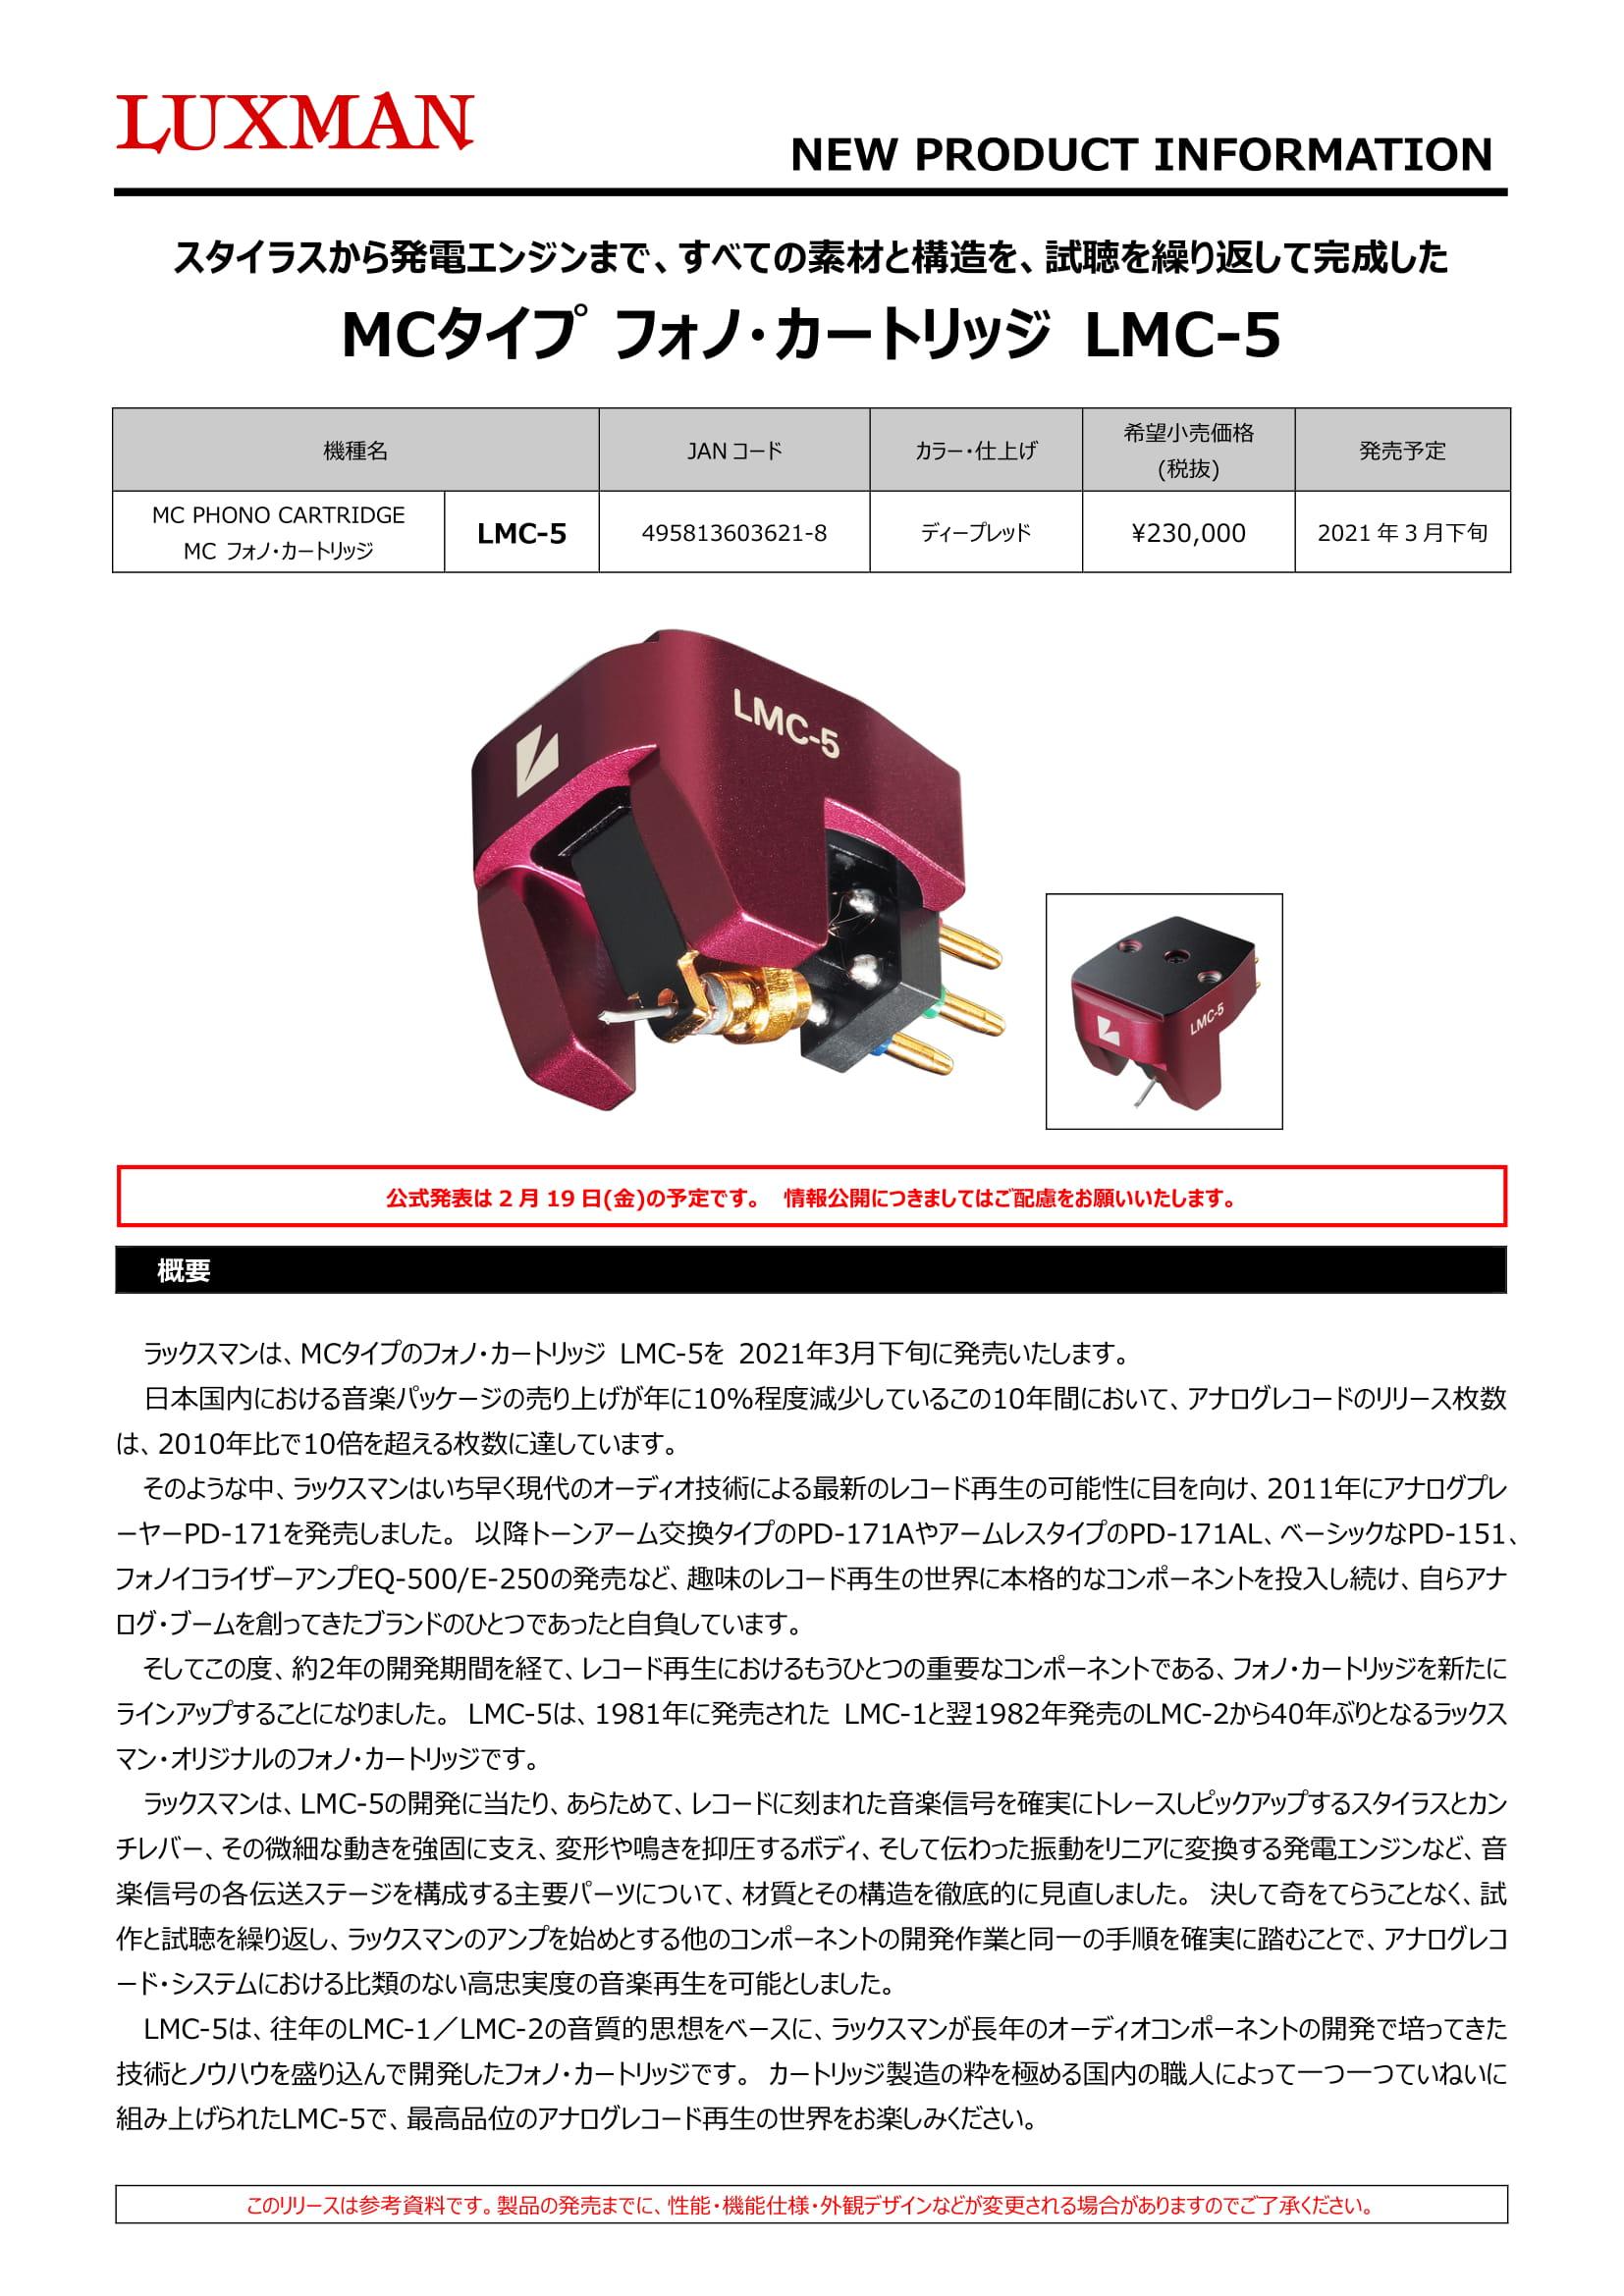 210219 LMC-5リリース-1